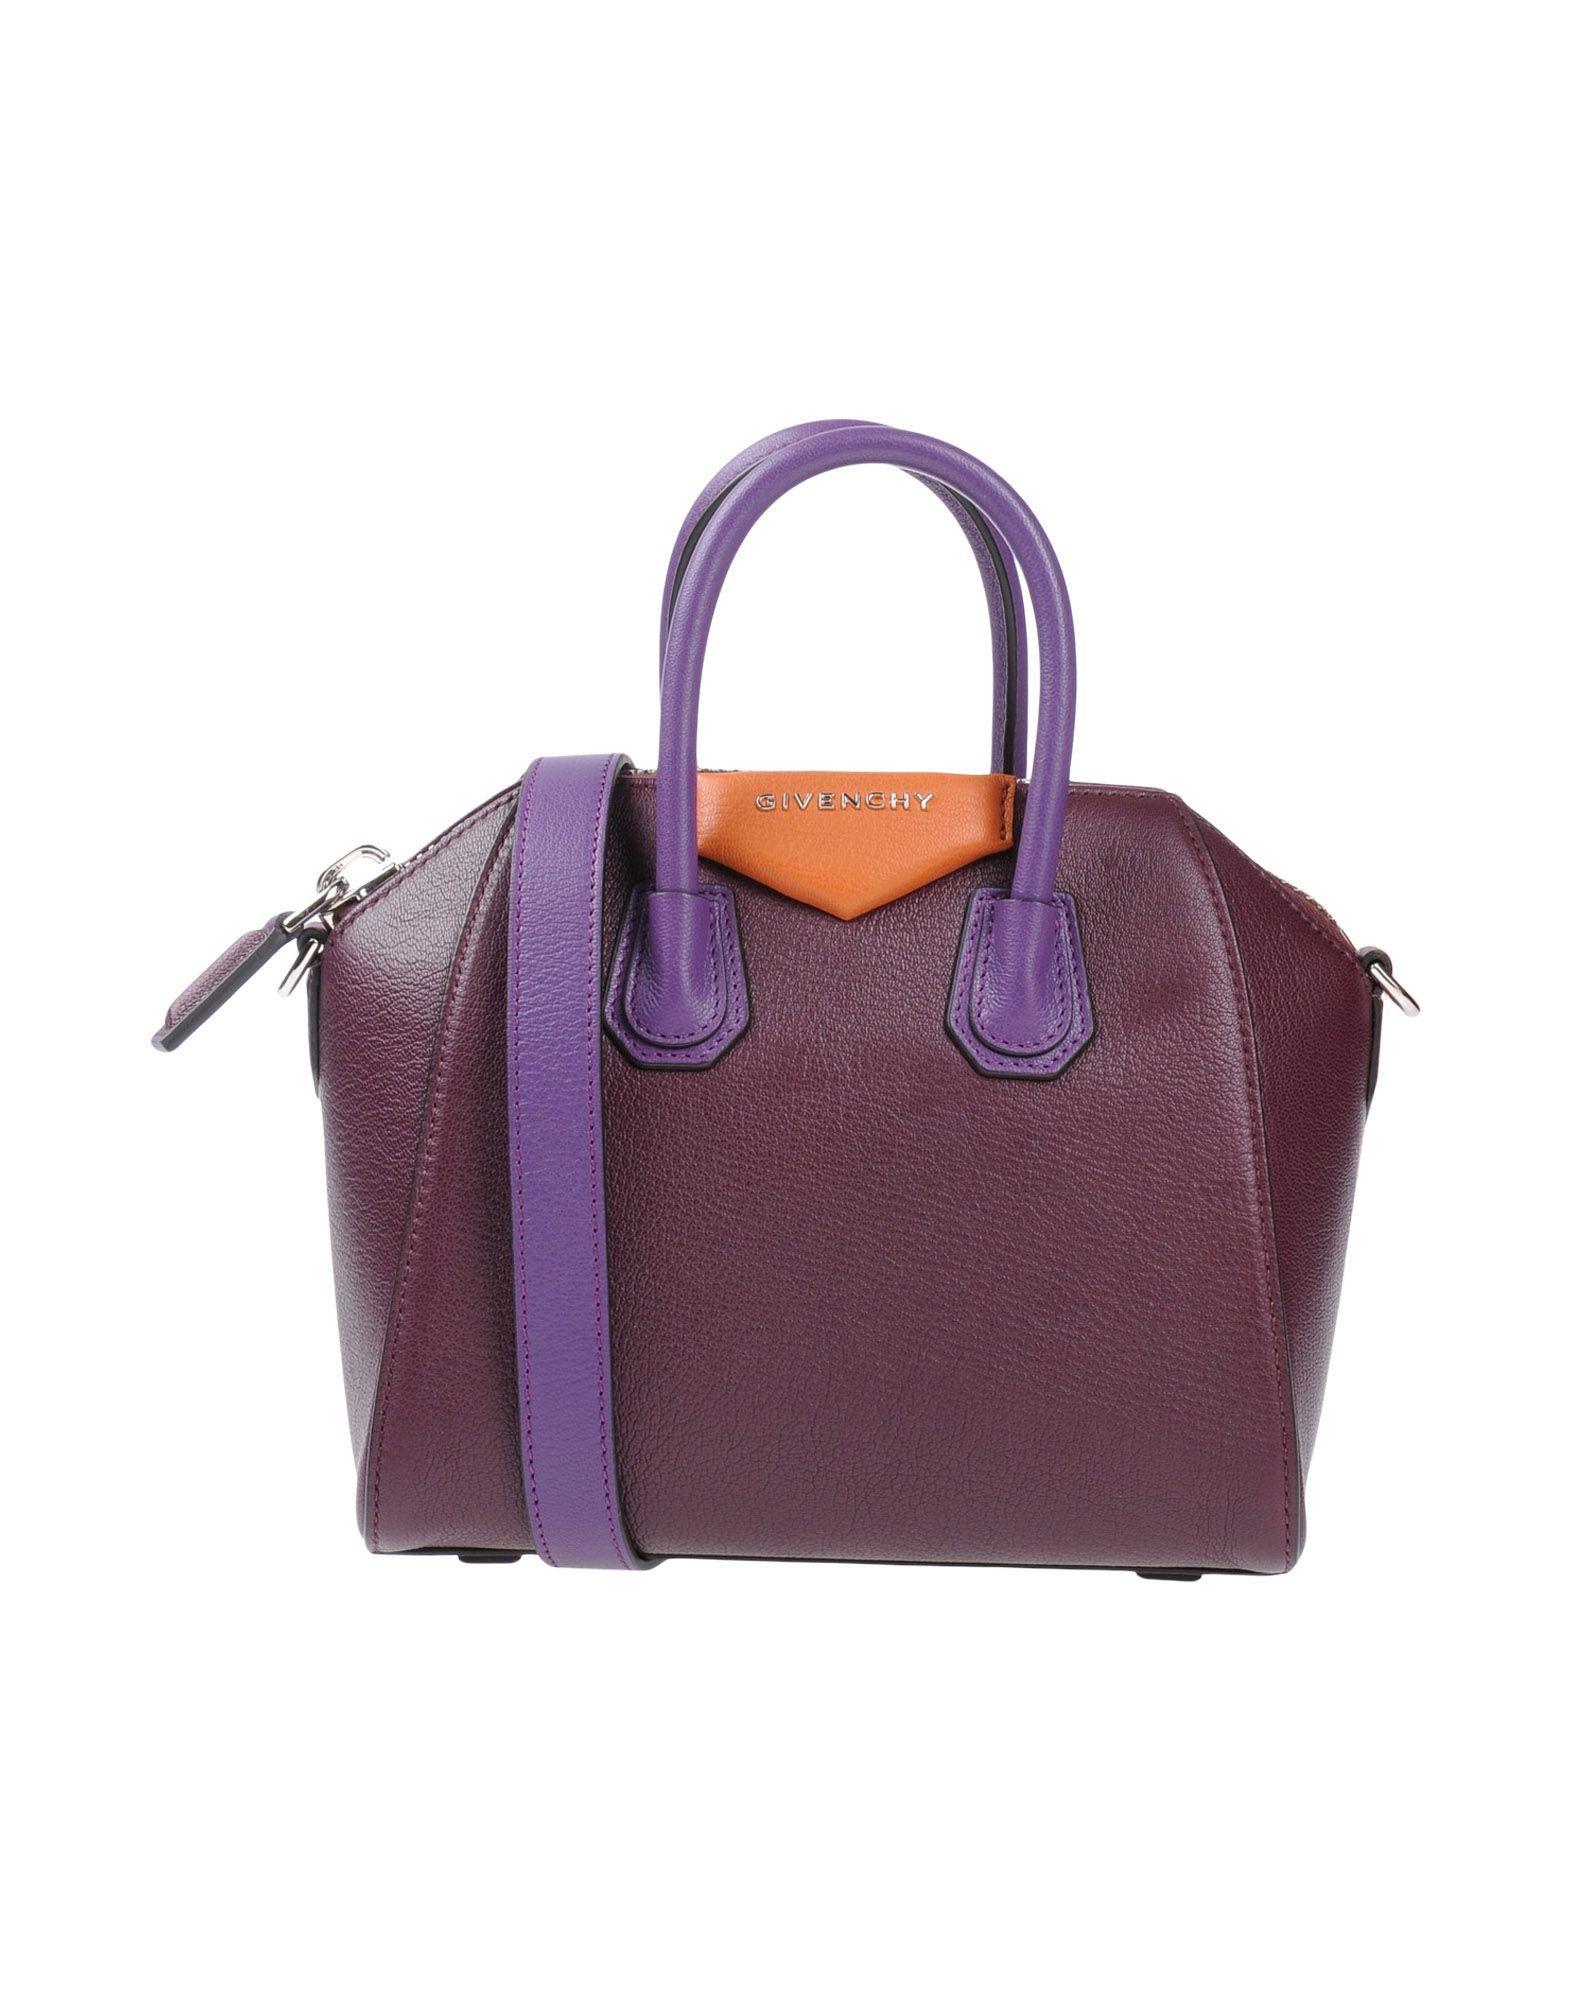 Givenchy Handbags In Deep Purple